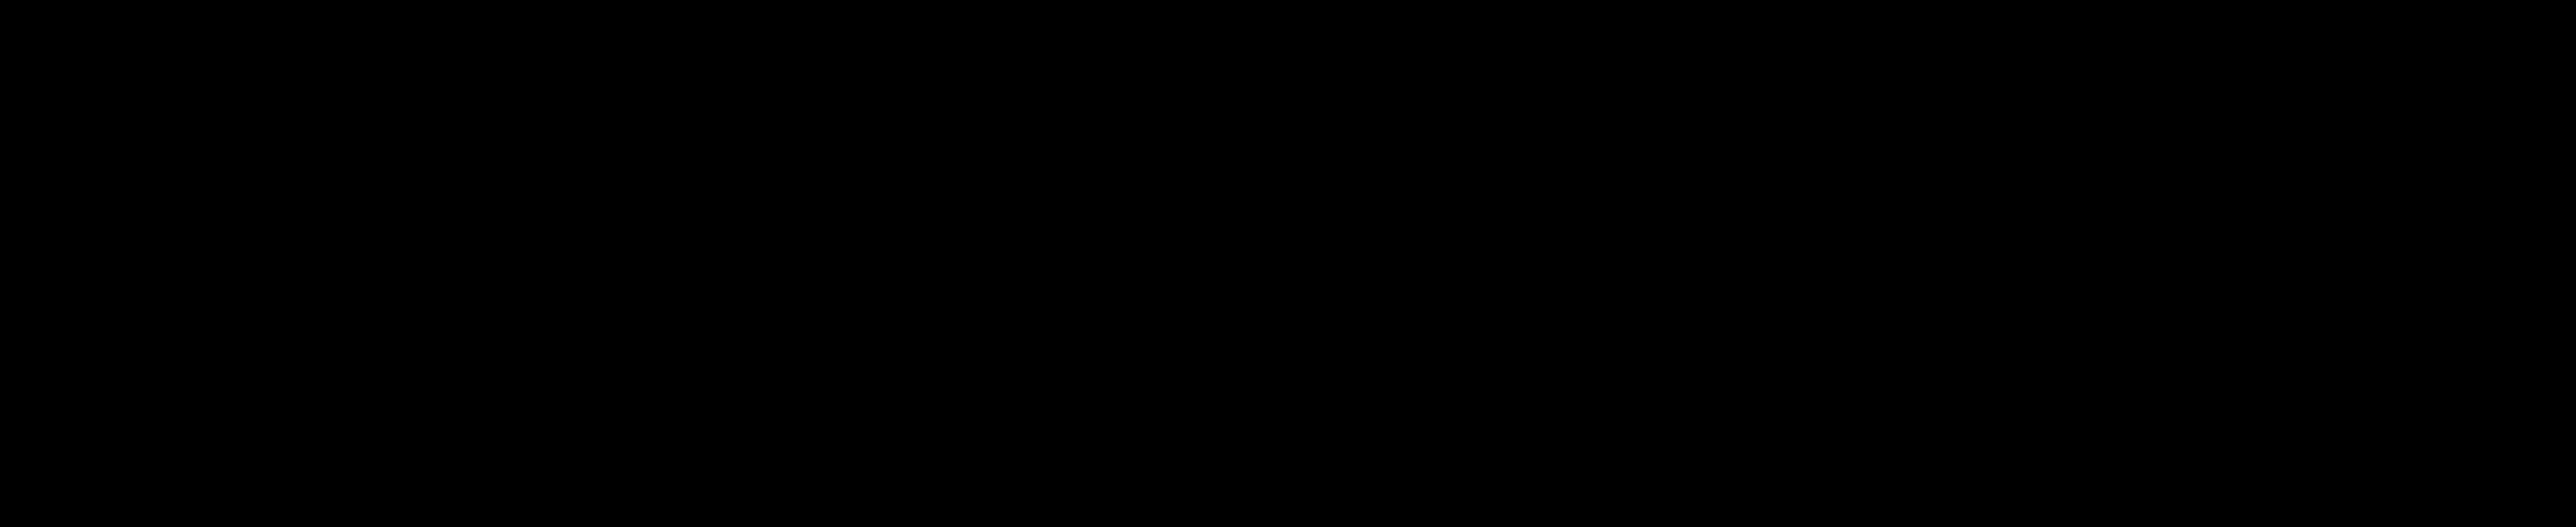 Di-O-glycinoylcurcumin-d<sub>6</sub> dihydrochloride